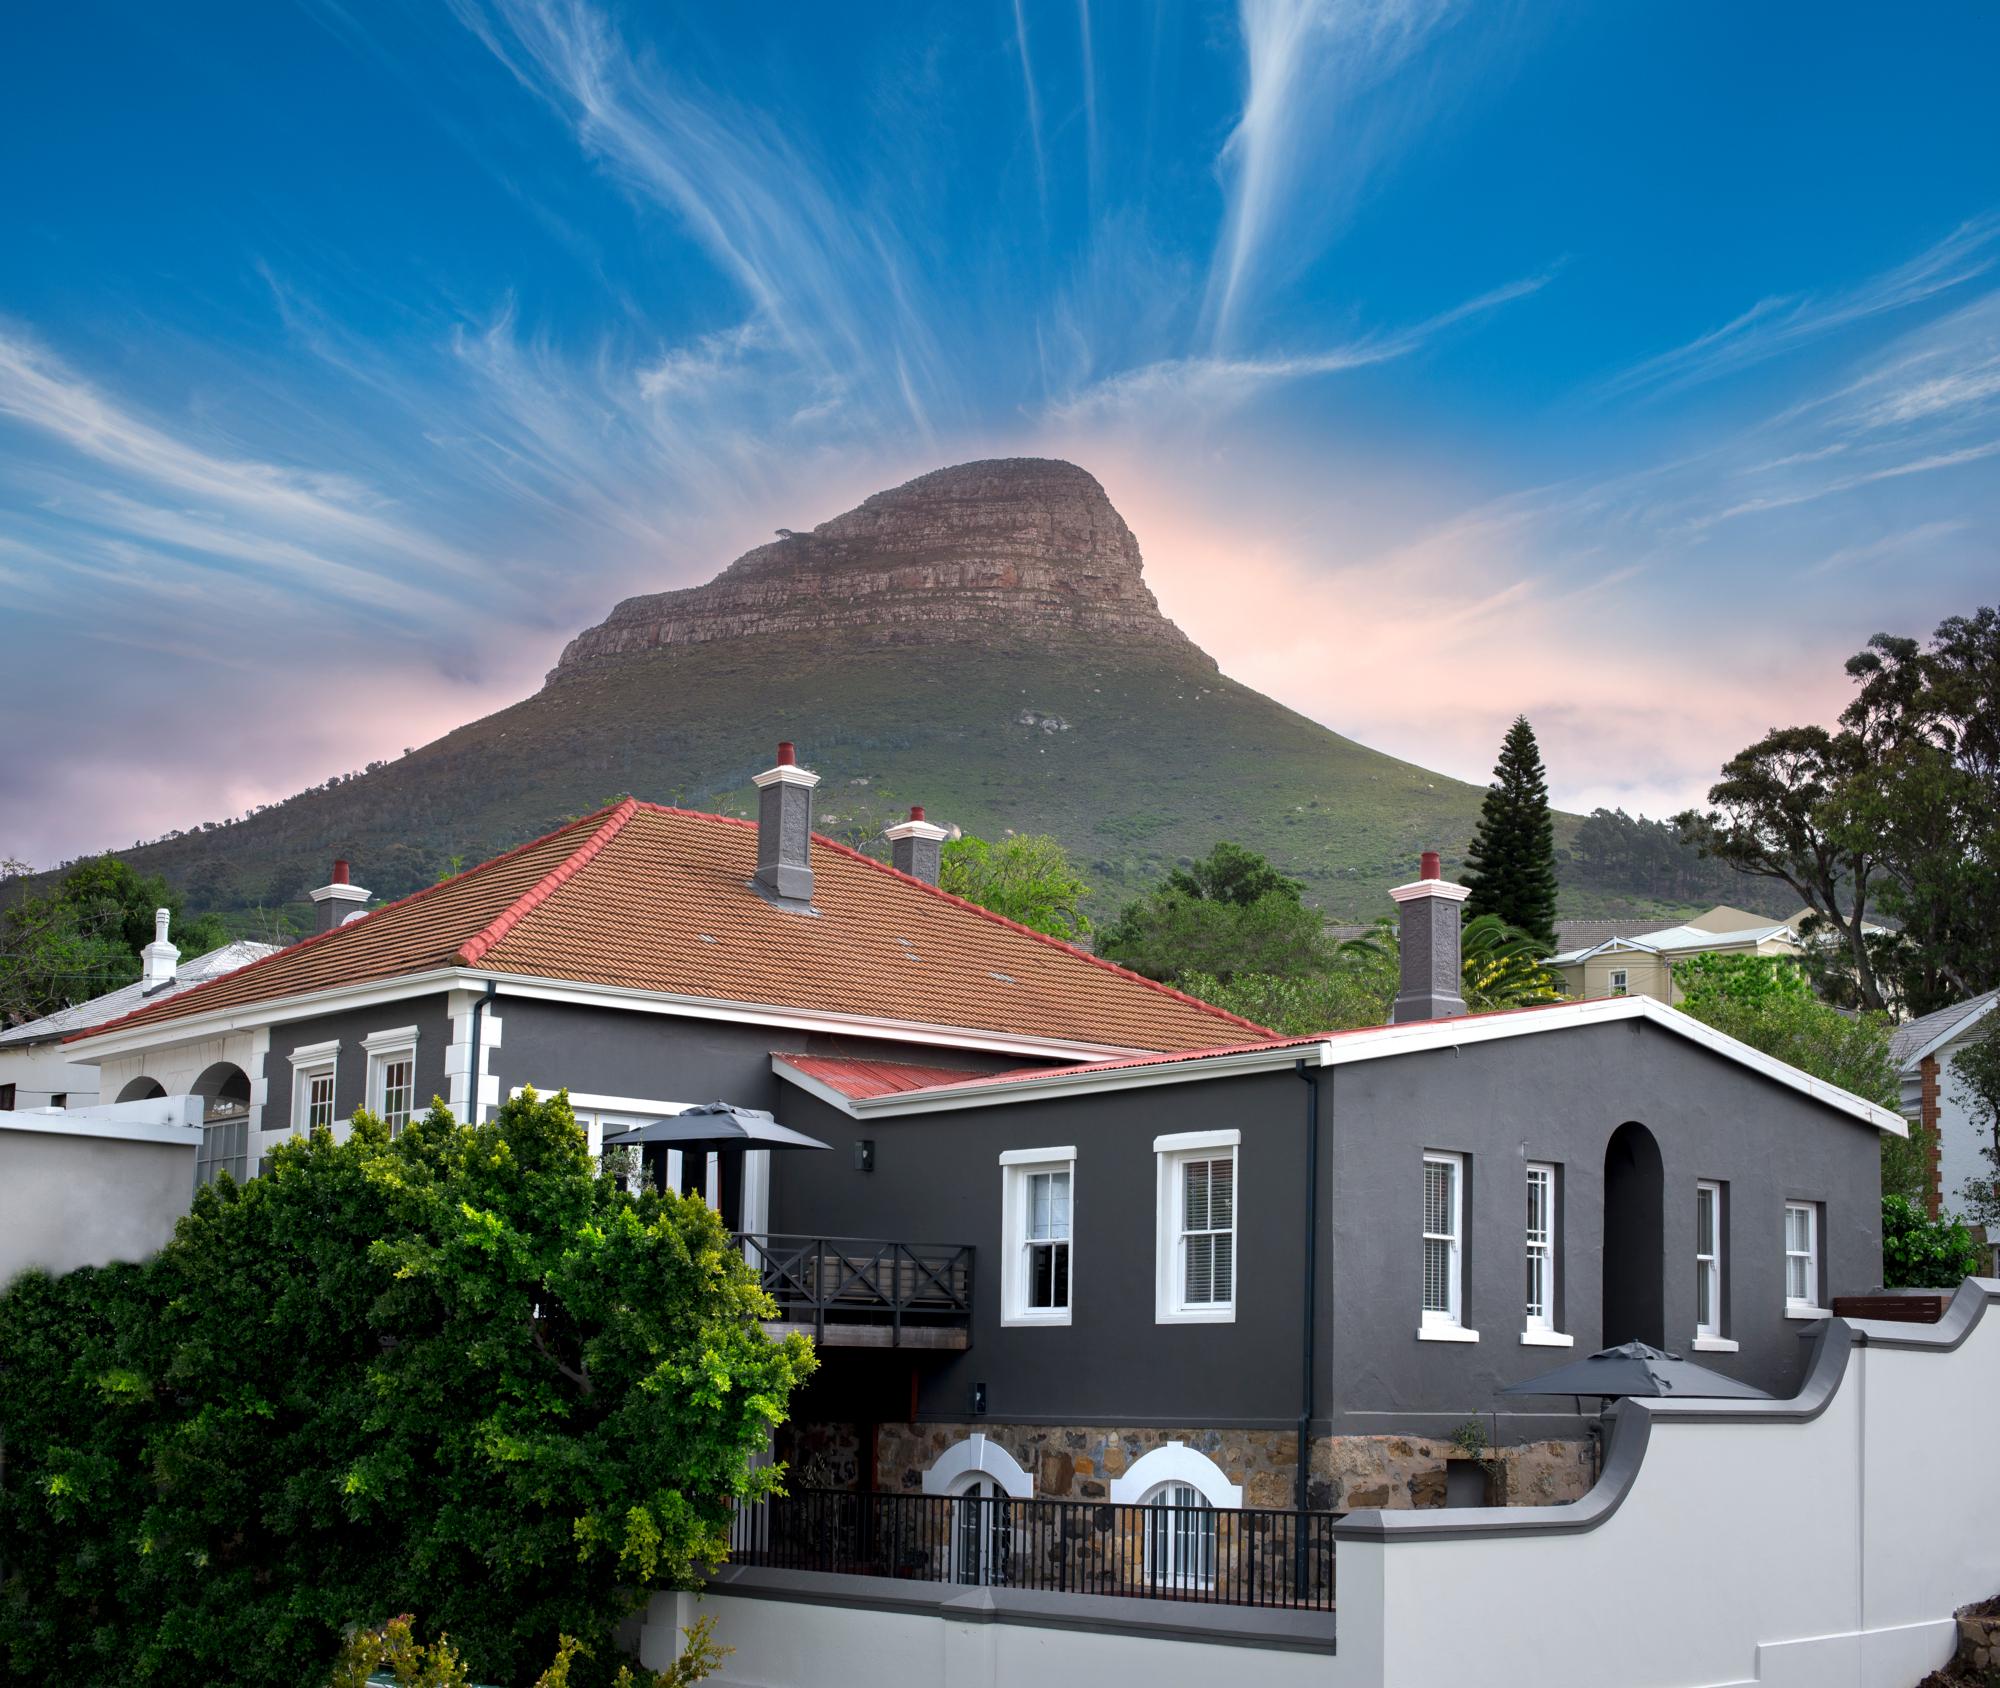 More Quarters Hotel - Cape Town - Hotel backdrop